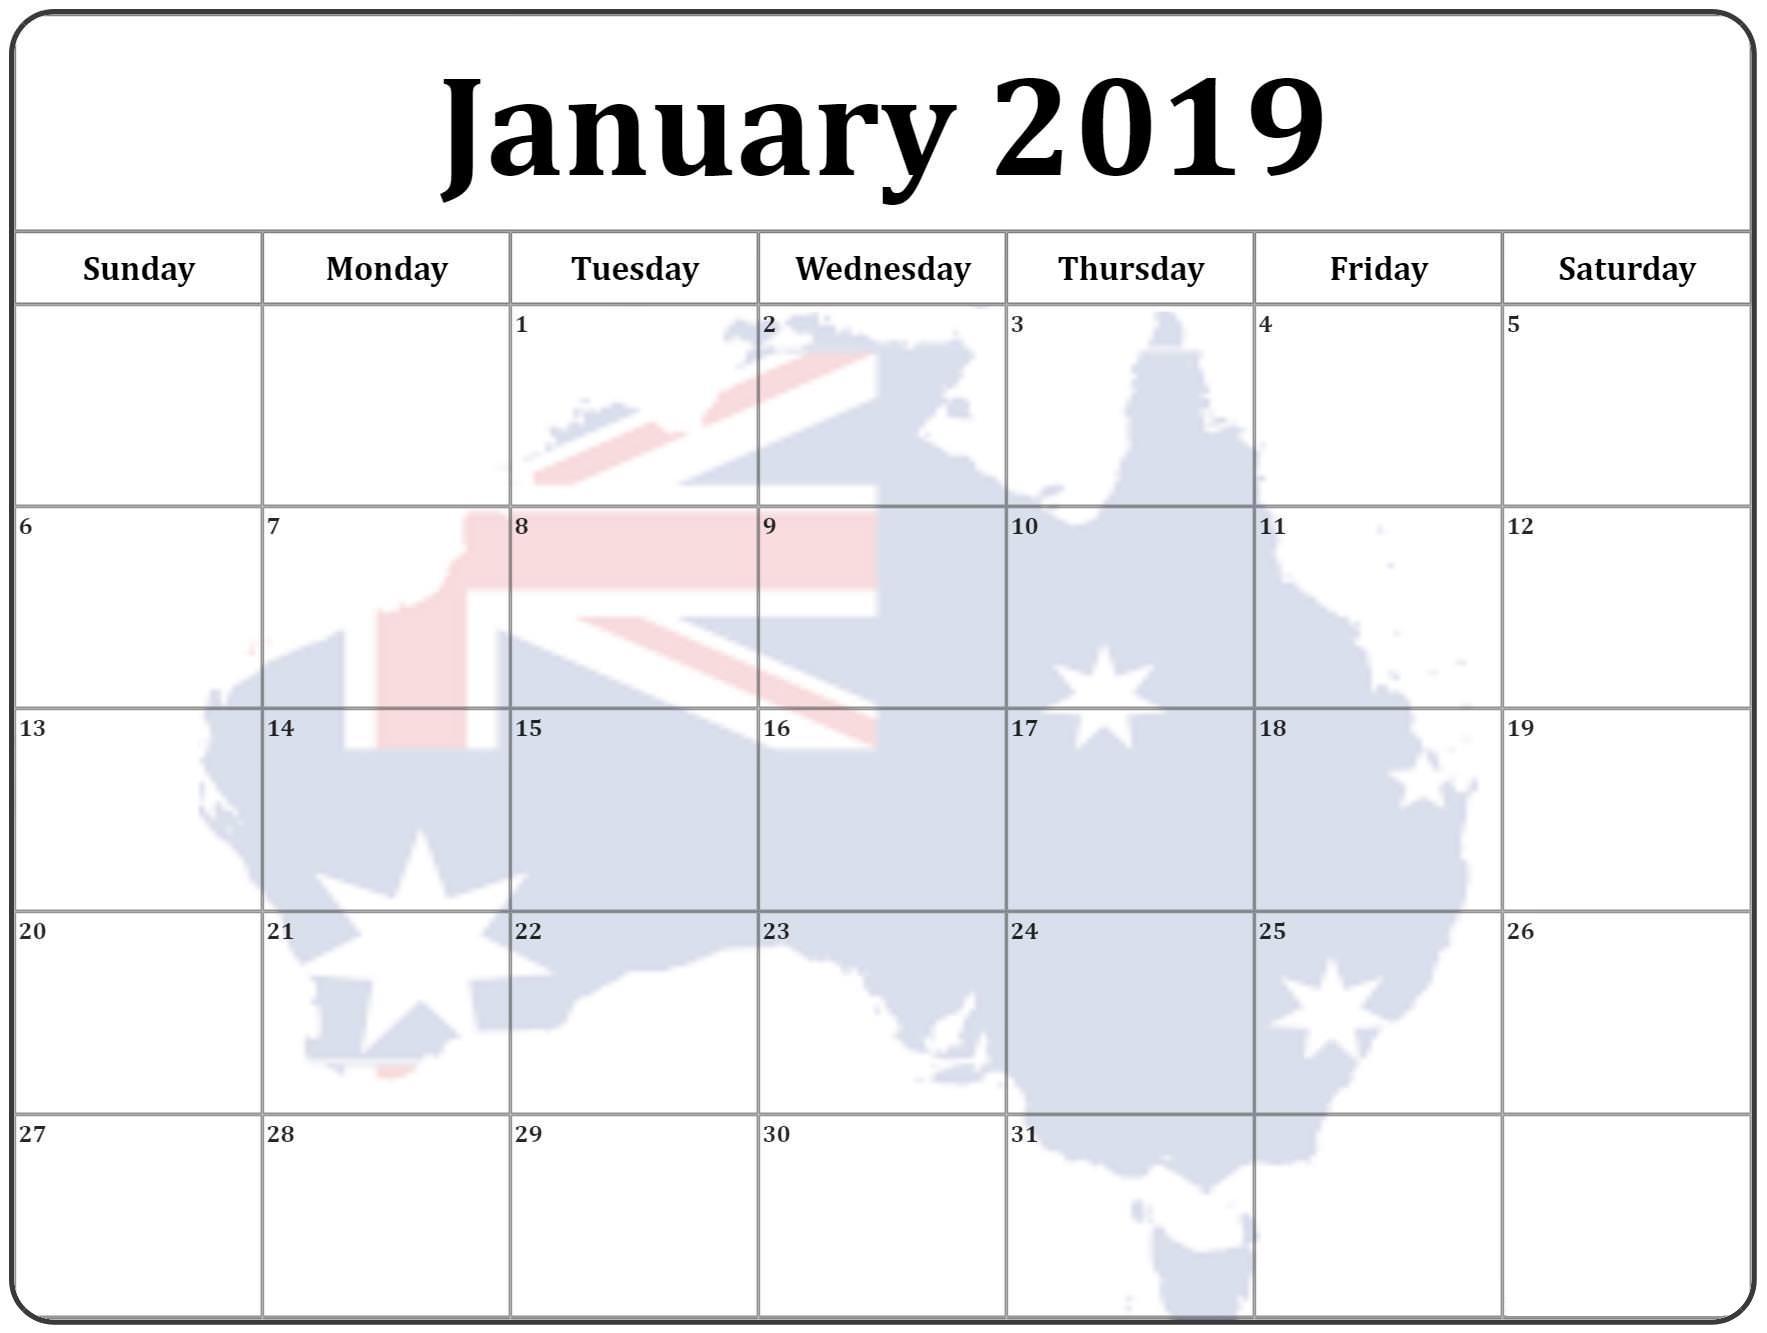 January 2019 Calendar For Australia